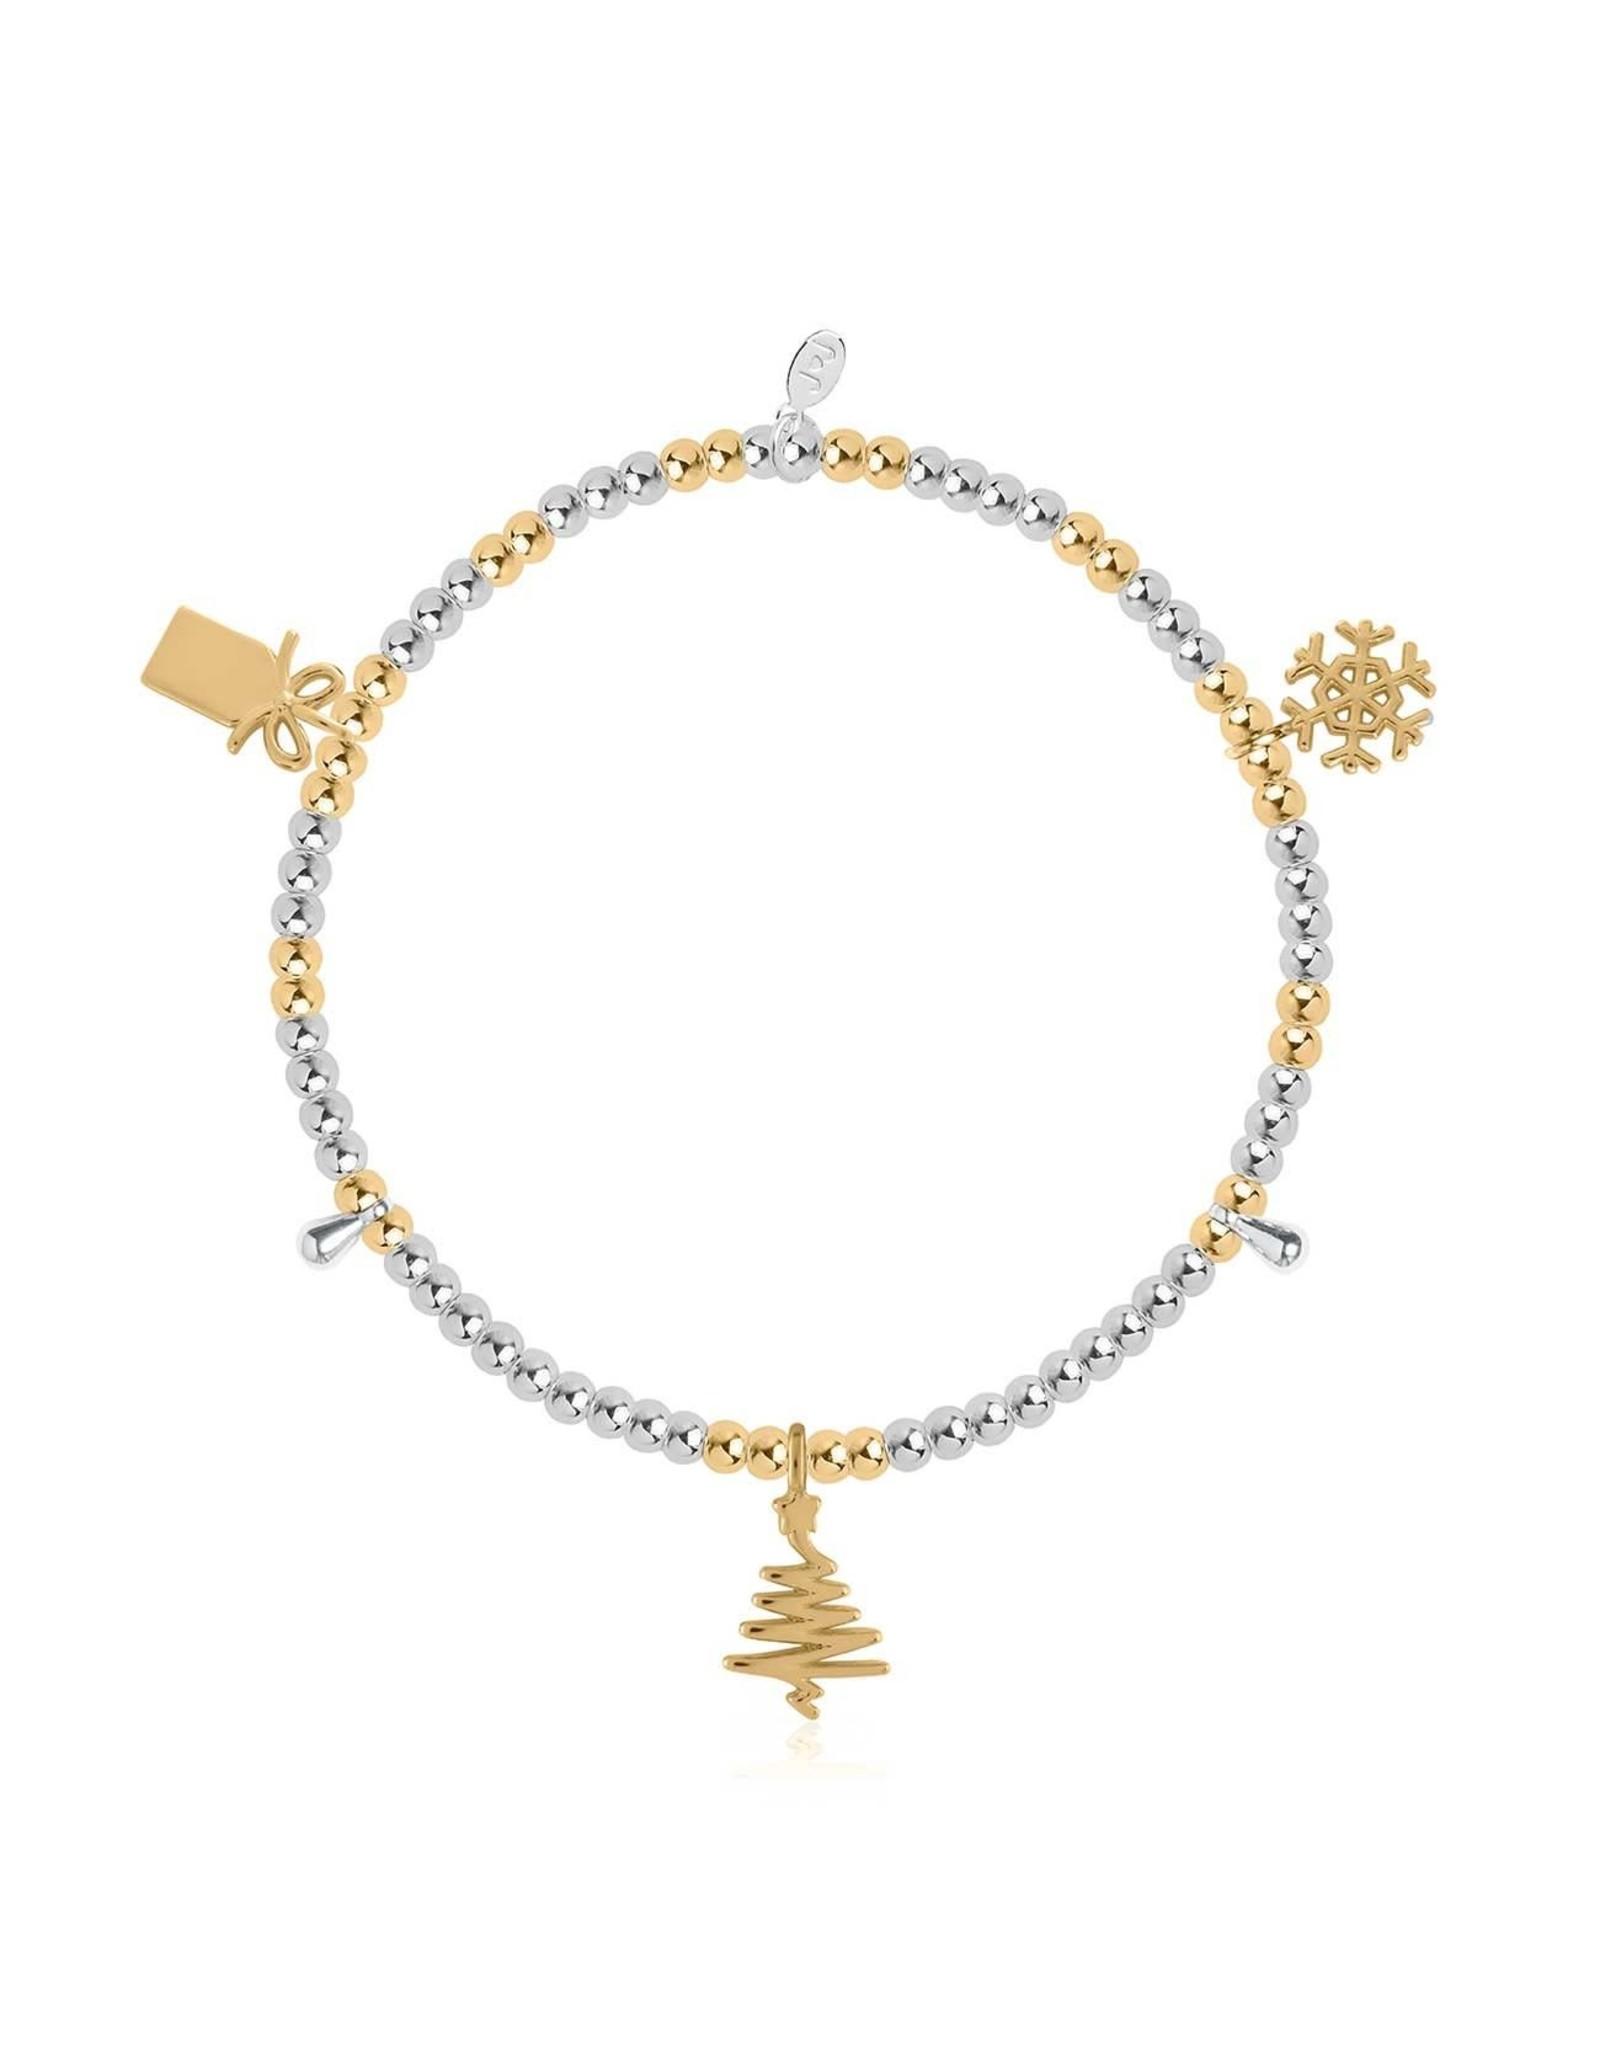 Joma Jewellery Life's a Charm - Christmas Wishes